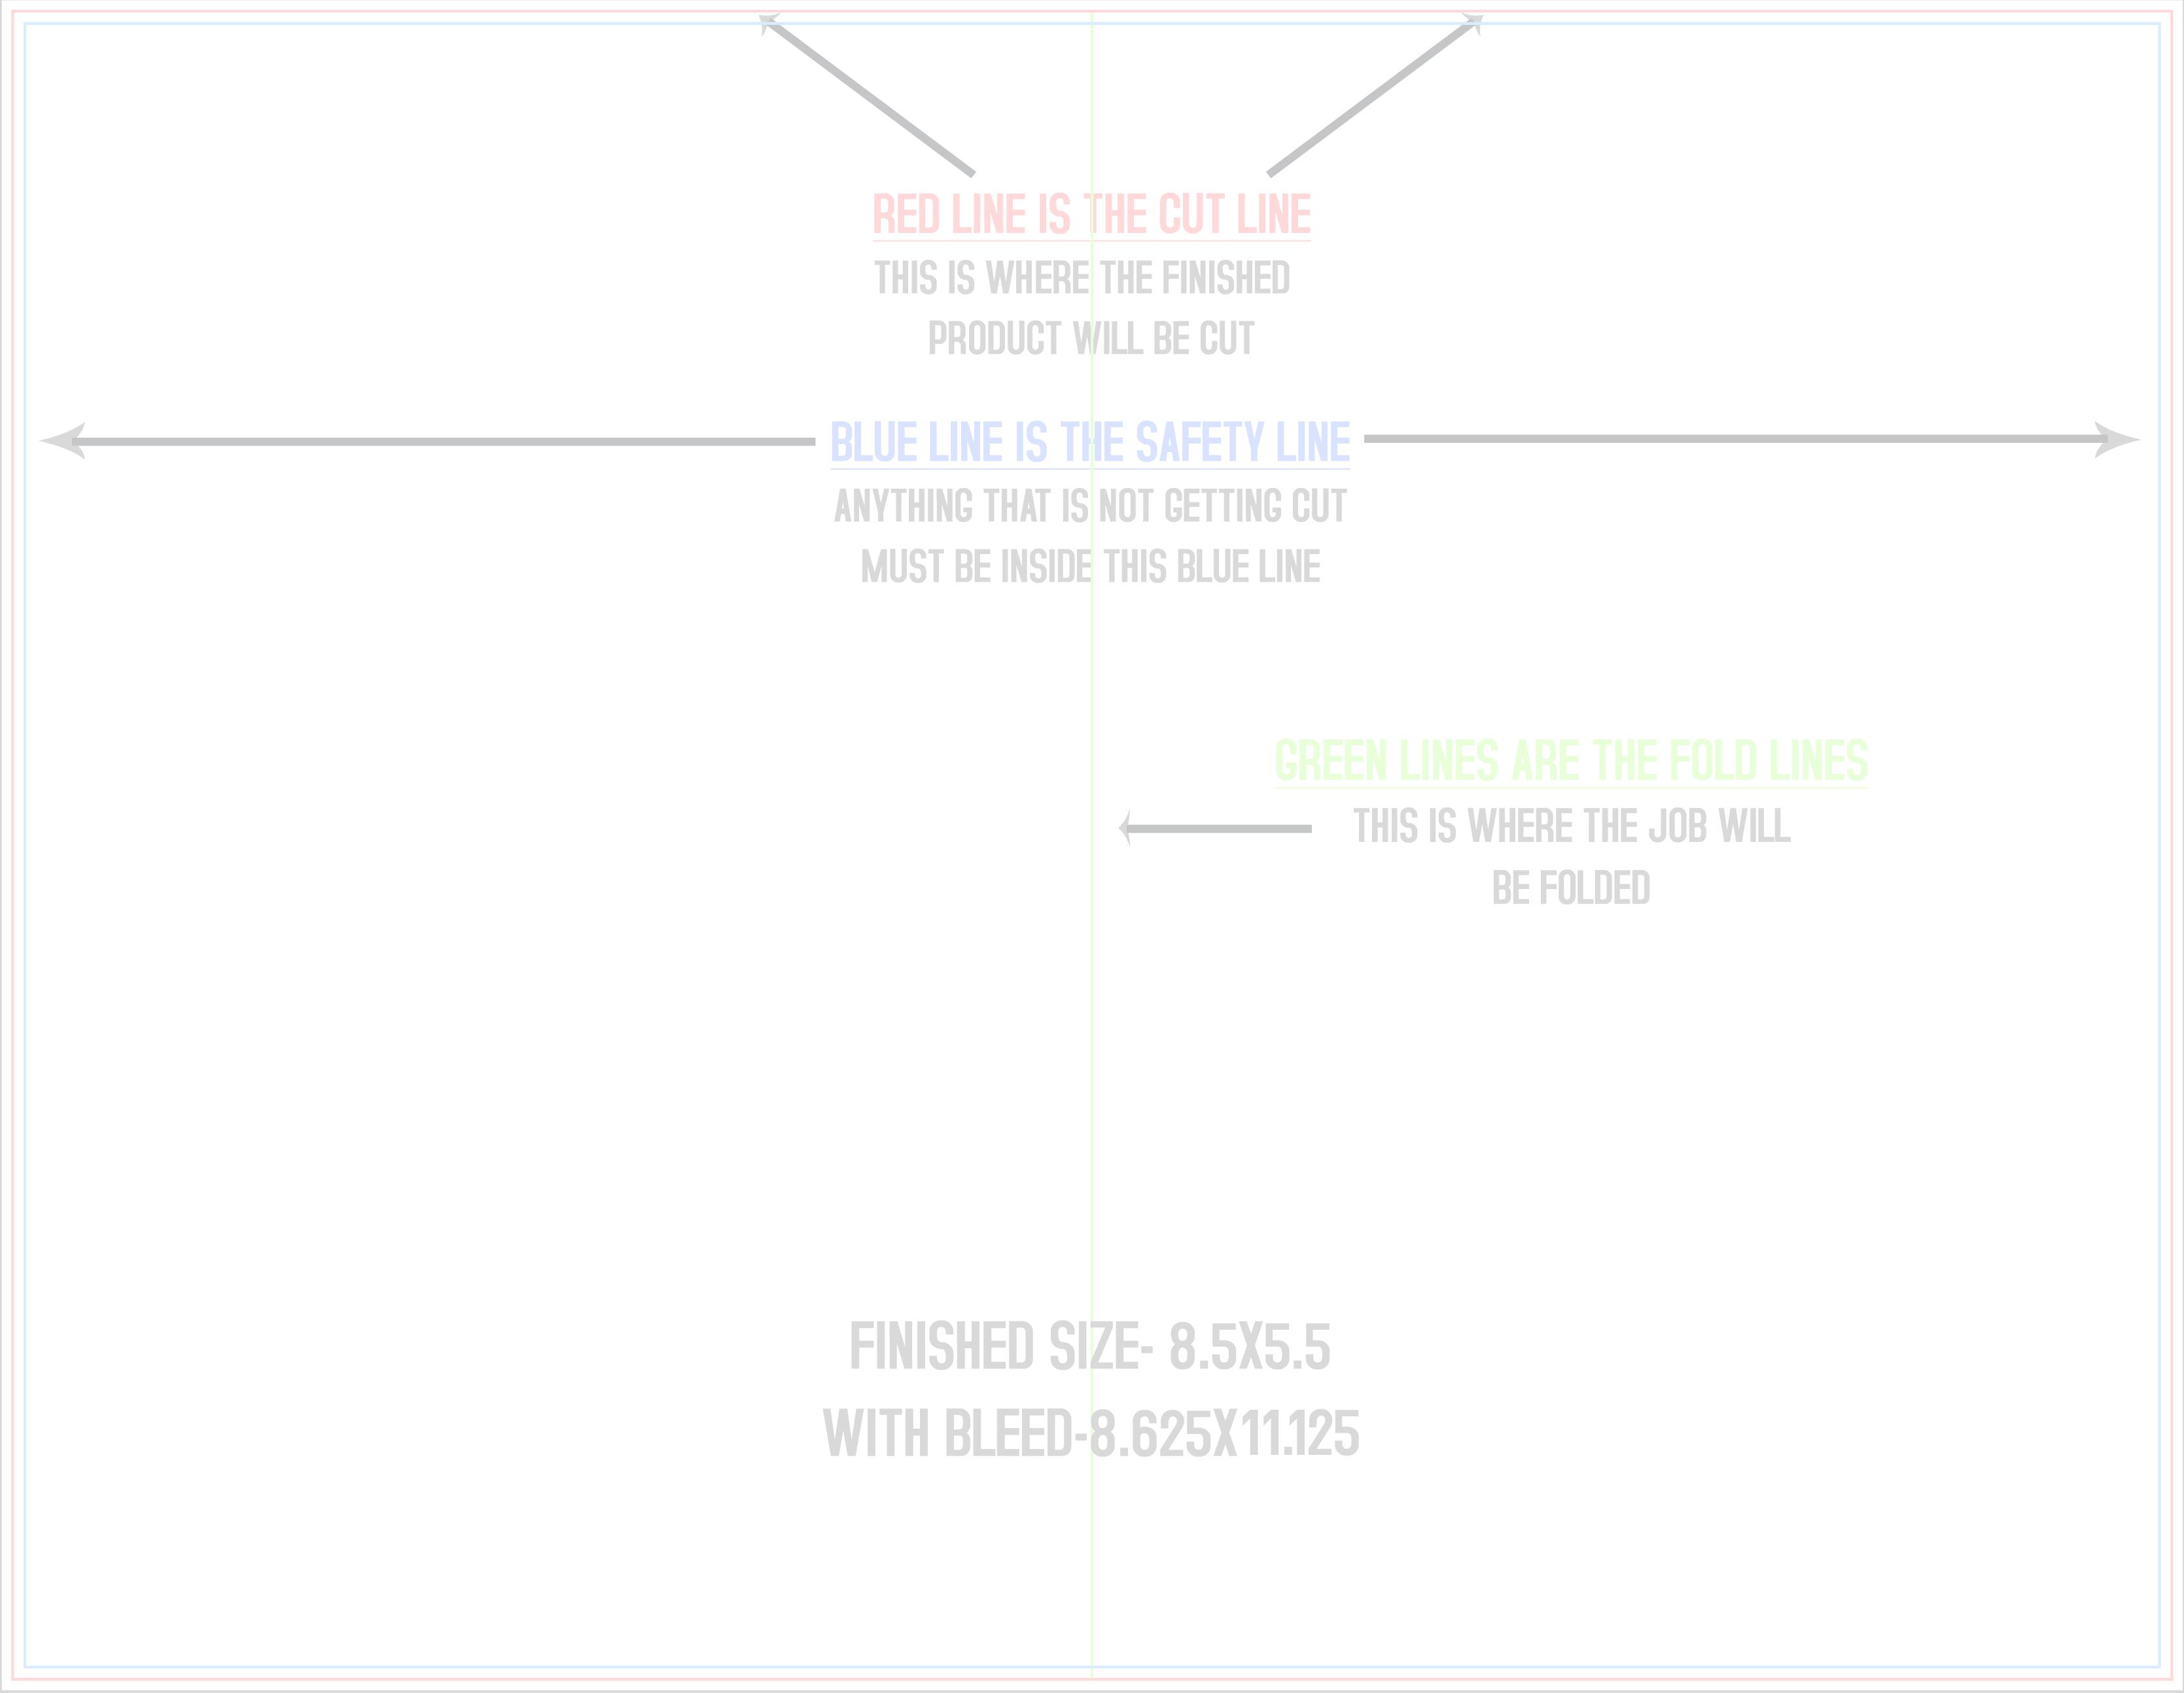 Full Color Brochures Menus Printing Services PrintshaQcom - 85x11 tri fold brochure template